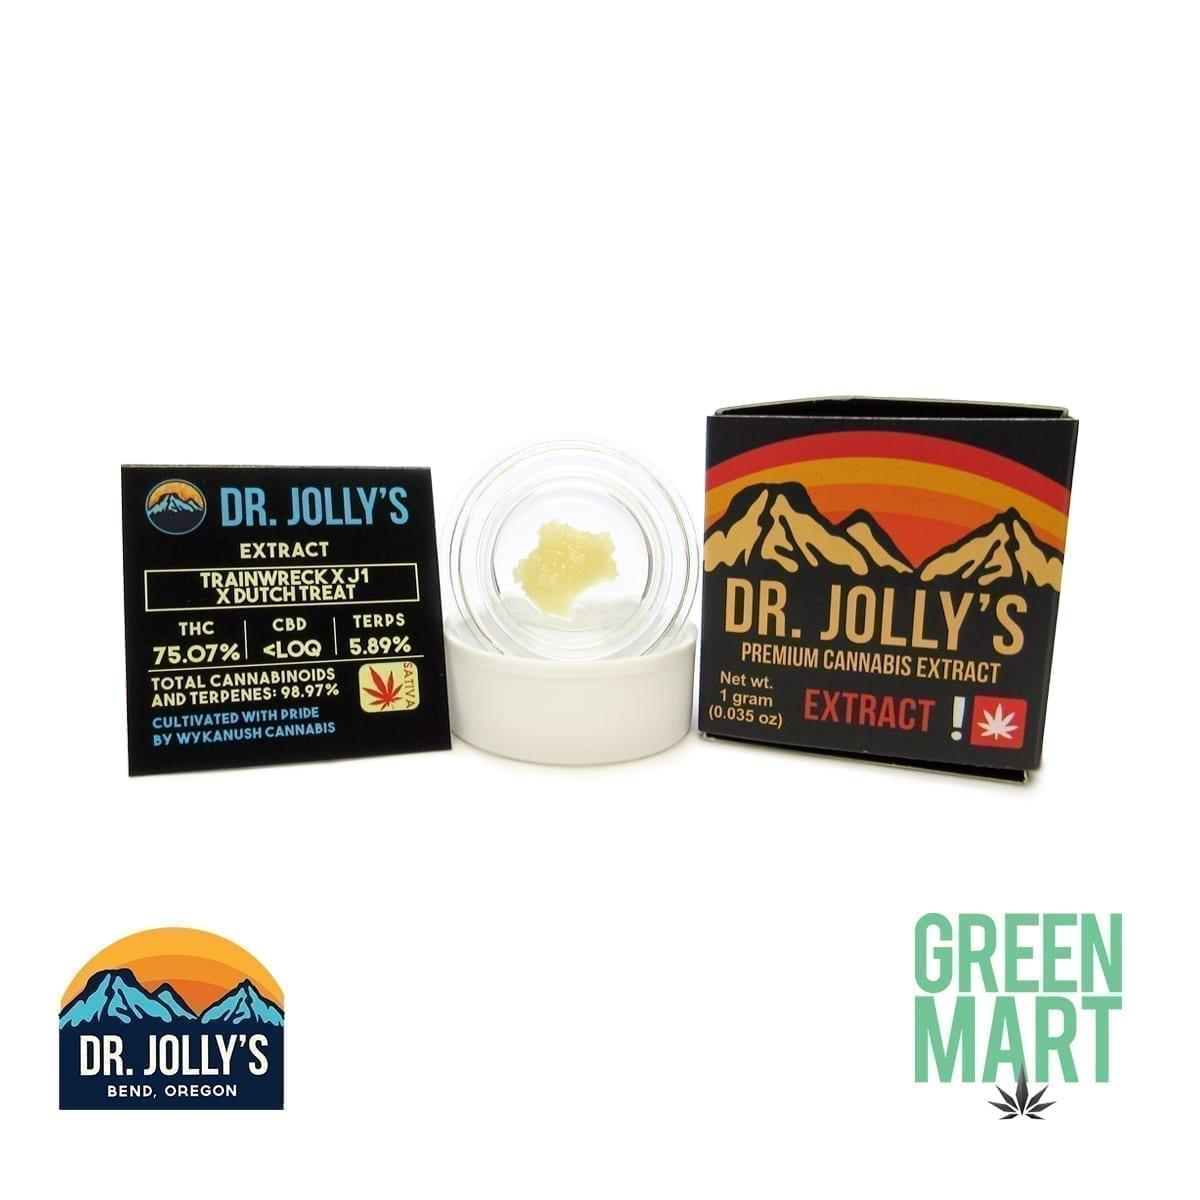 Dr. Jolly's Extracts - Trainwreck X J1 X Dutch Treat